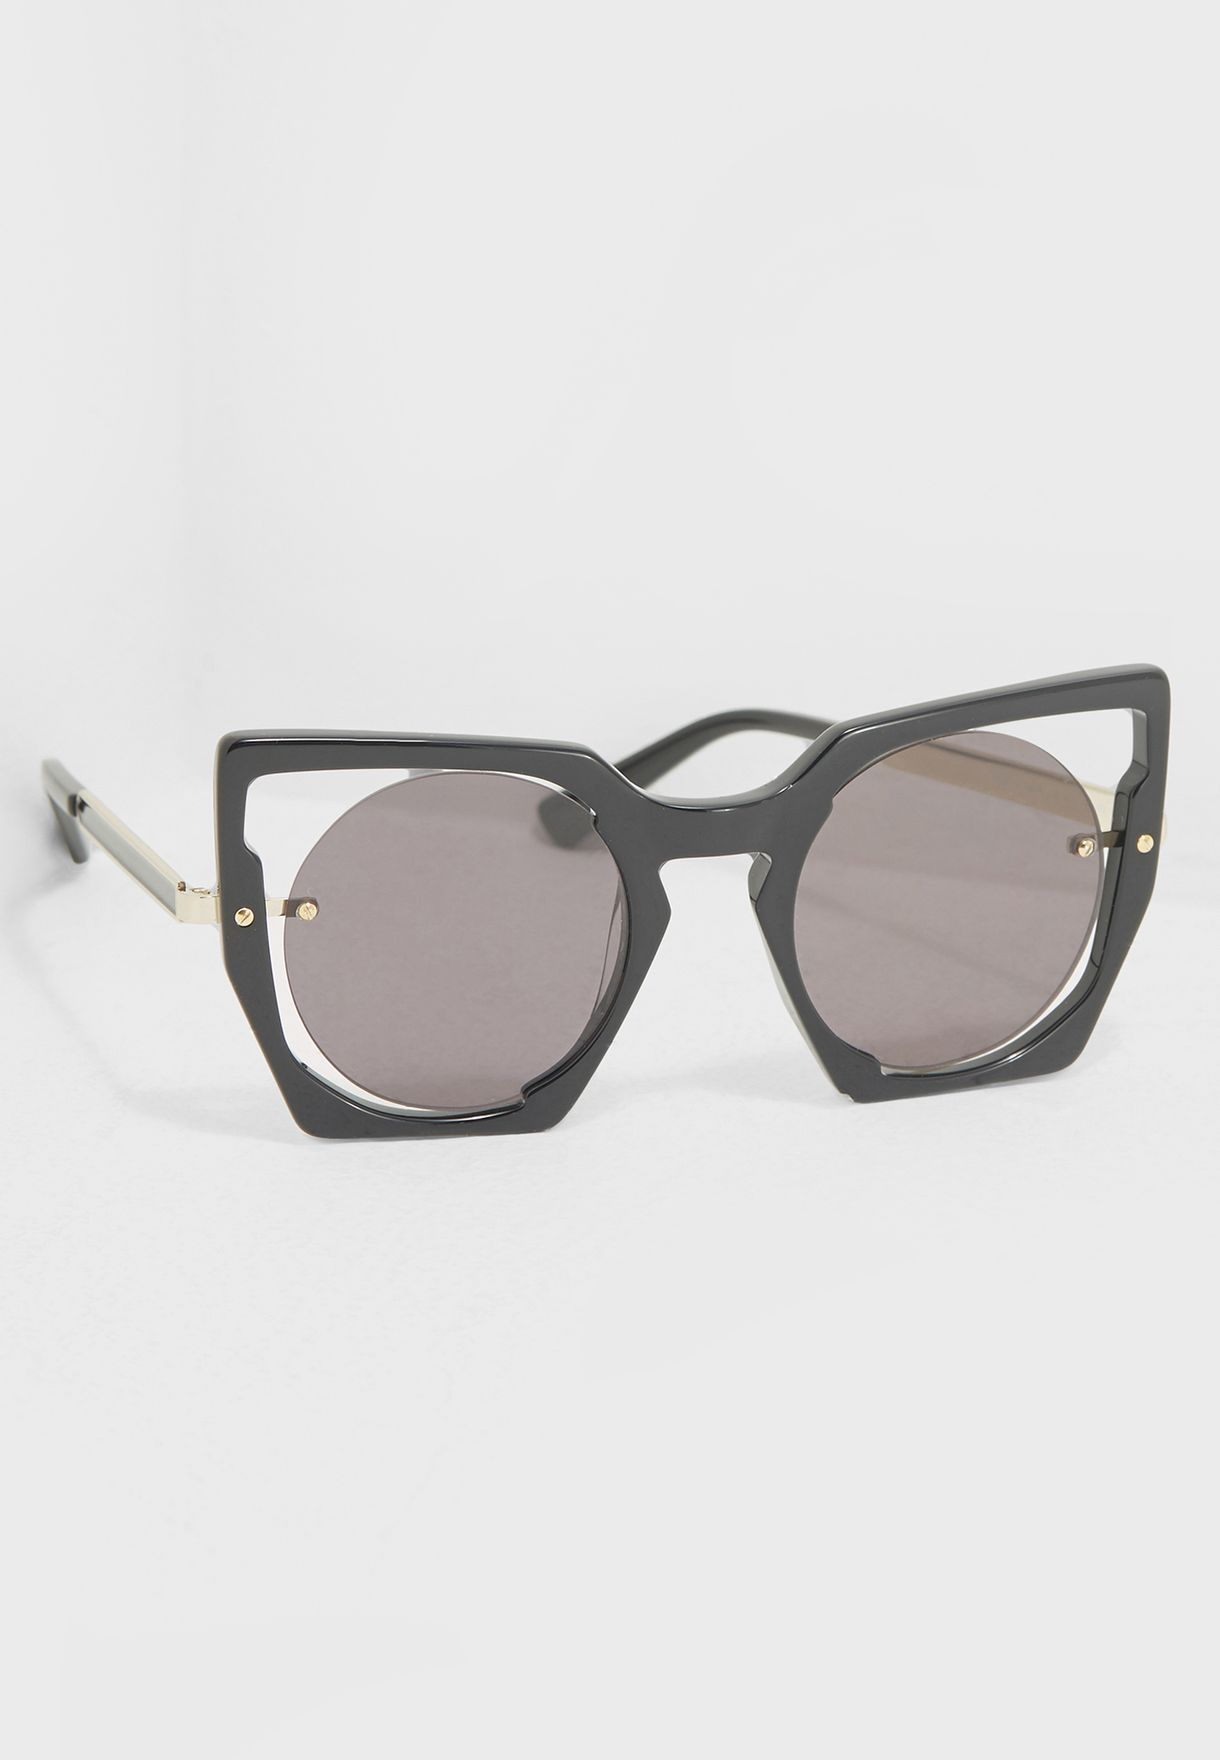 e8019f7f2623 Shop MCM black Statement Sunglasses MCM655S-001 for Women in UAE ...